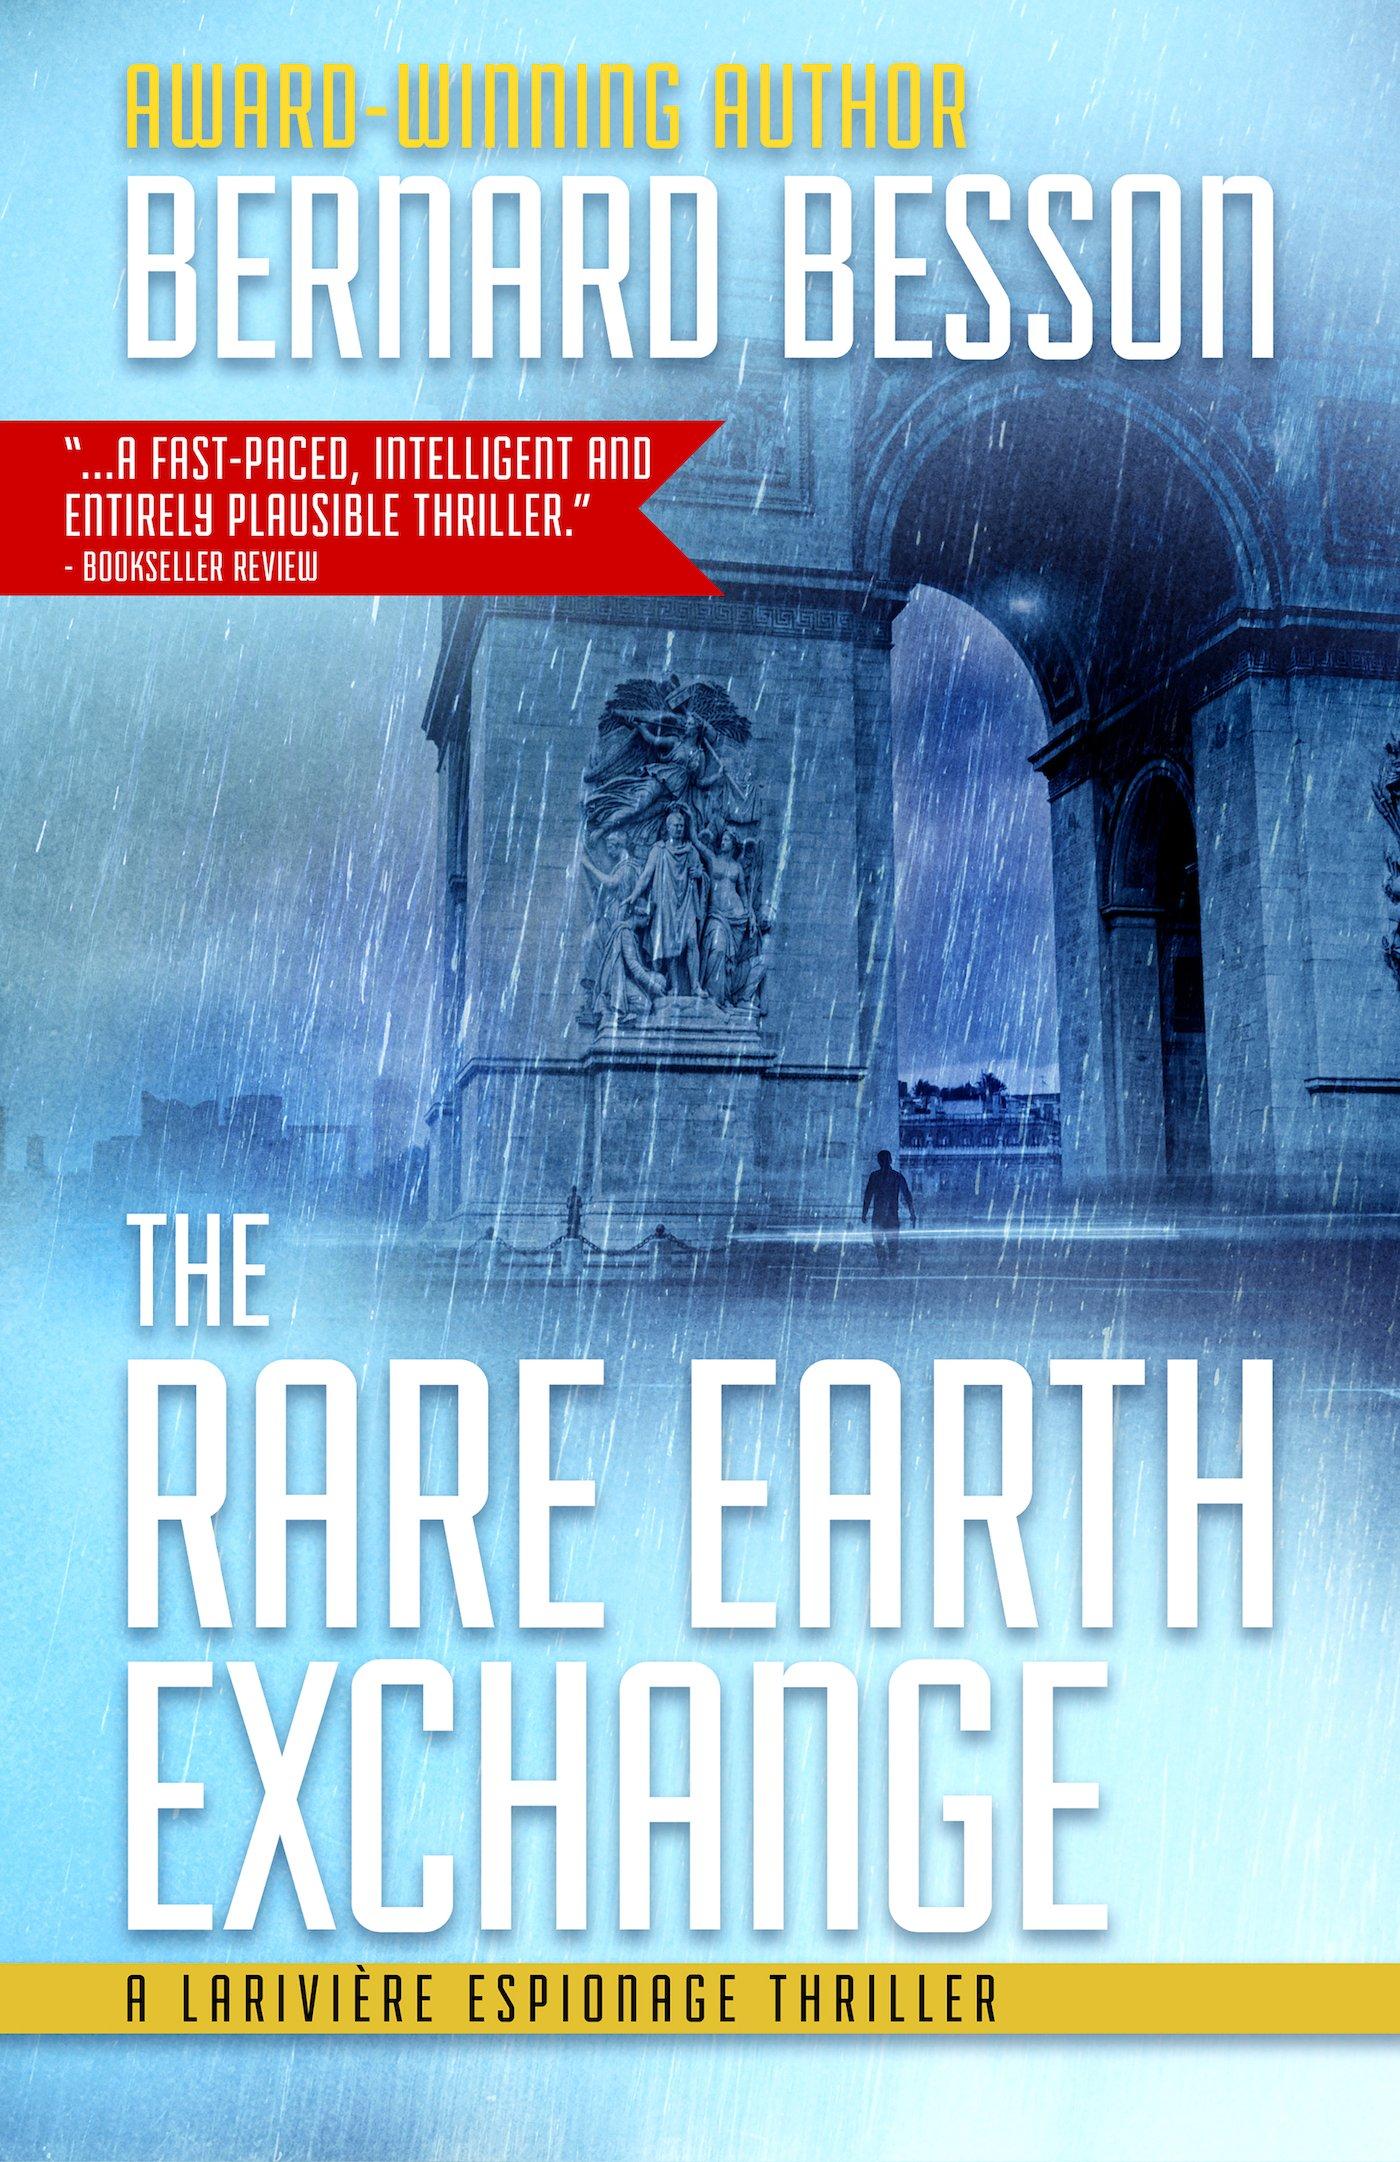 rare earth exchange